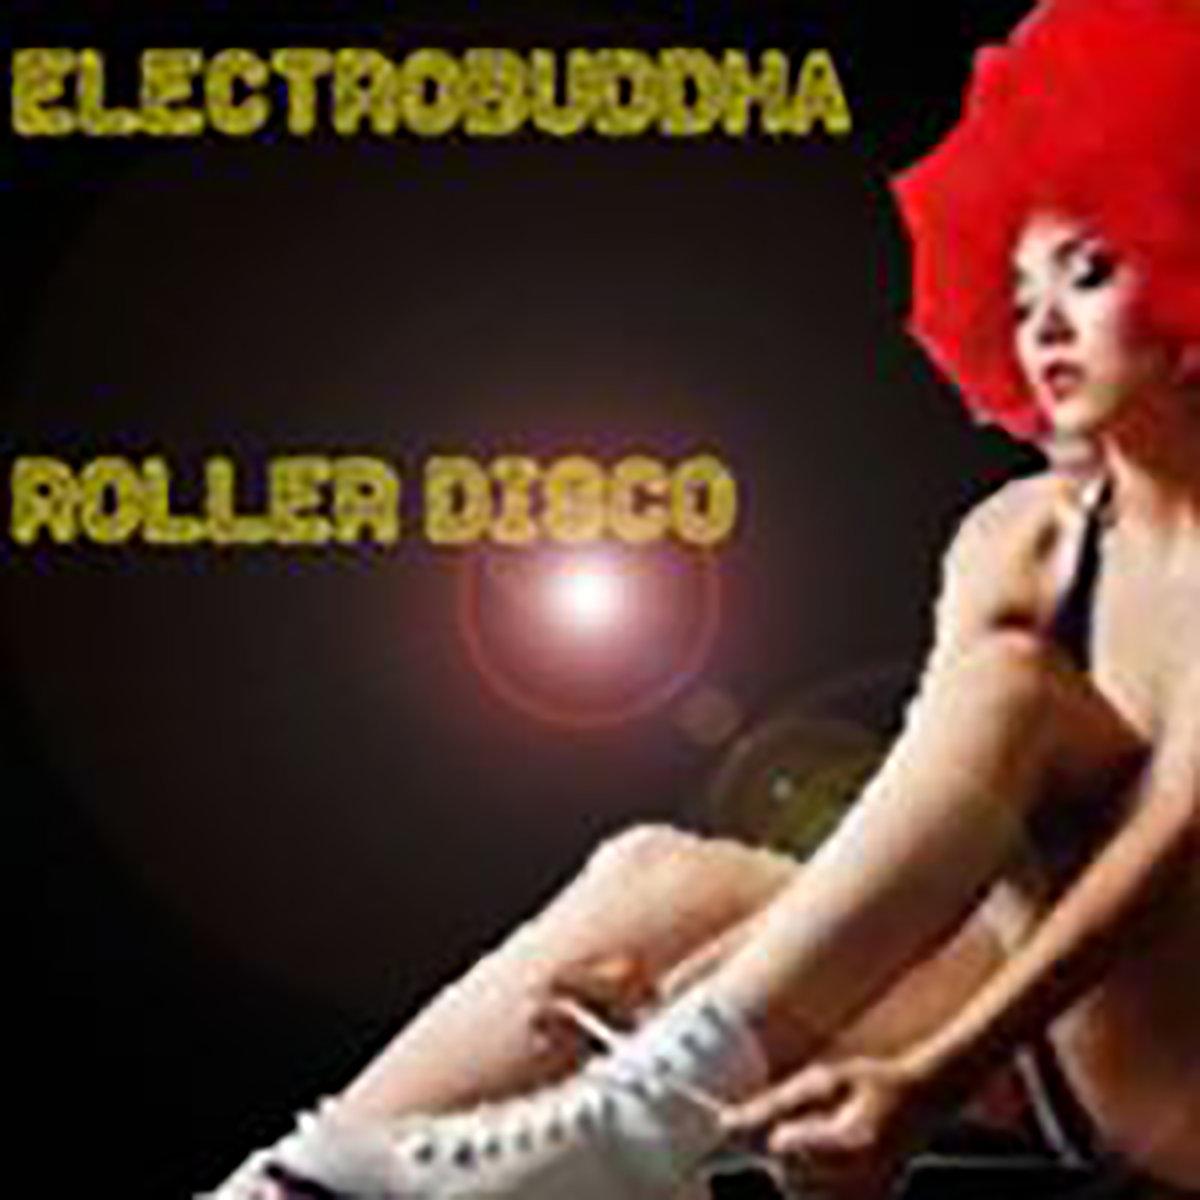 Electrobuddha Album 'Roller Disco'